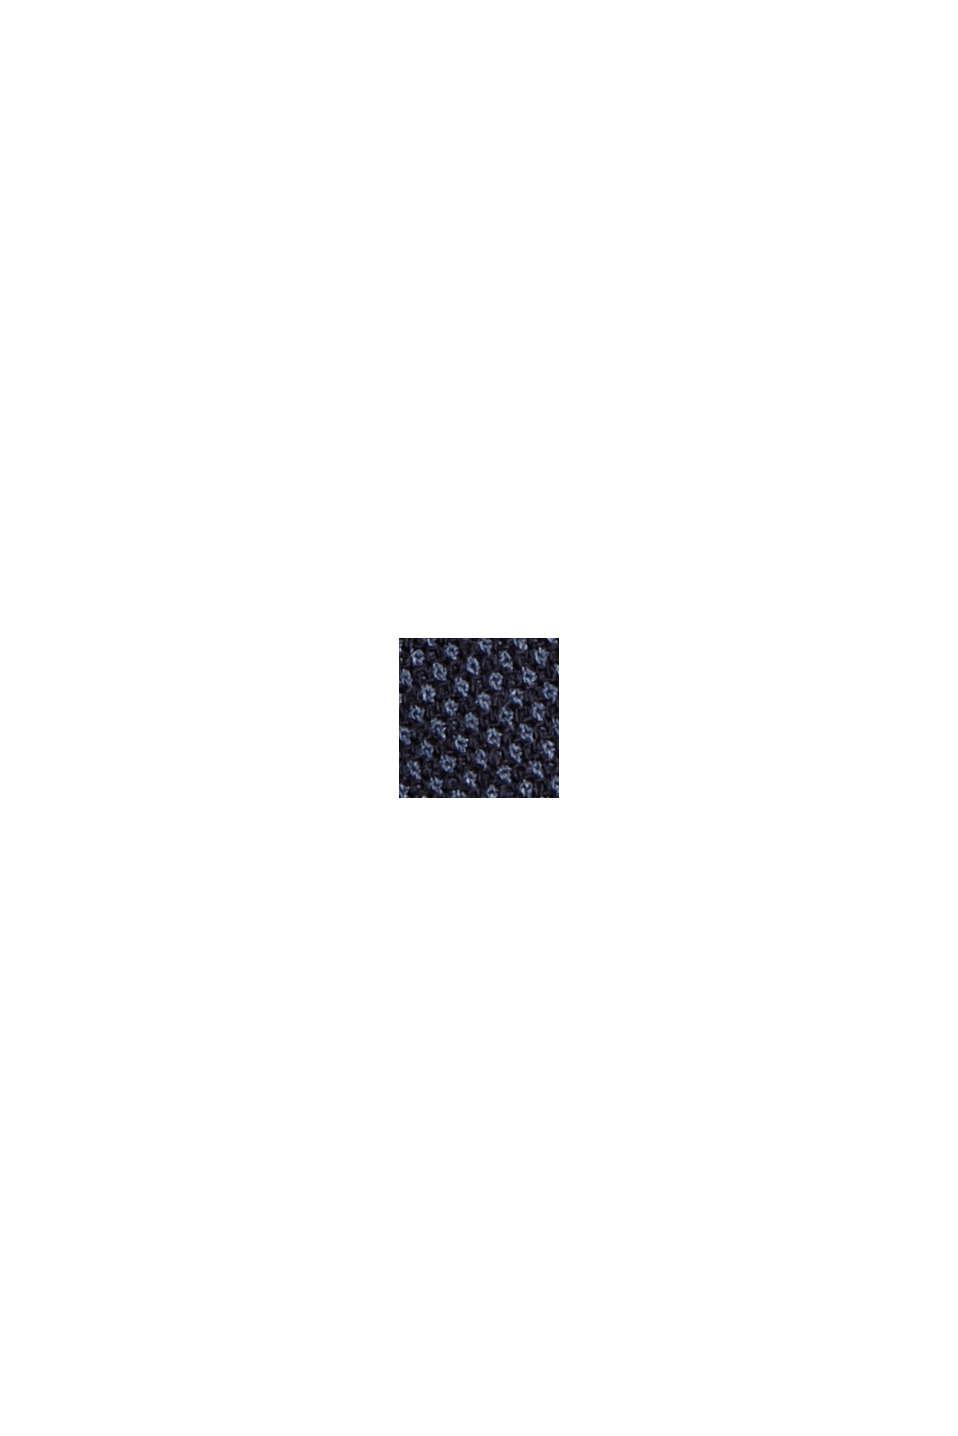 JOGG SUIT Bukser i uldmix, BLUE, swatch